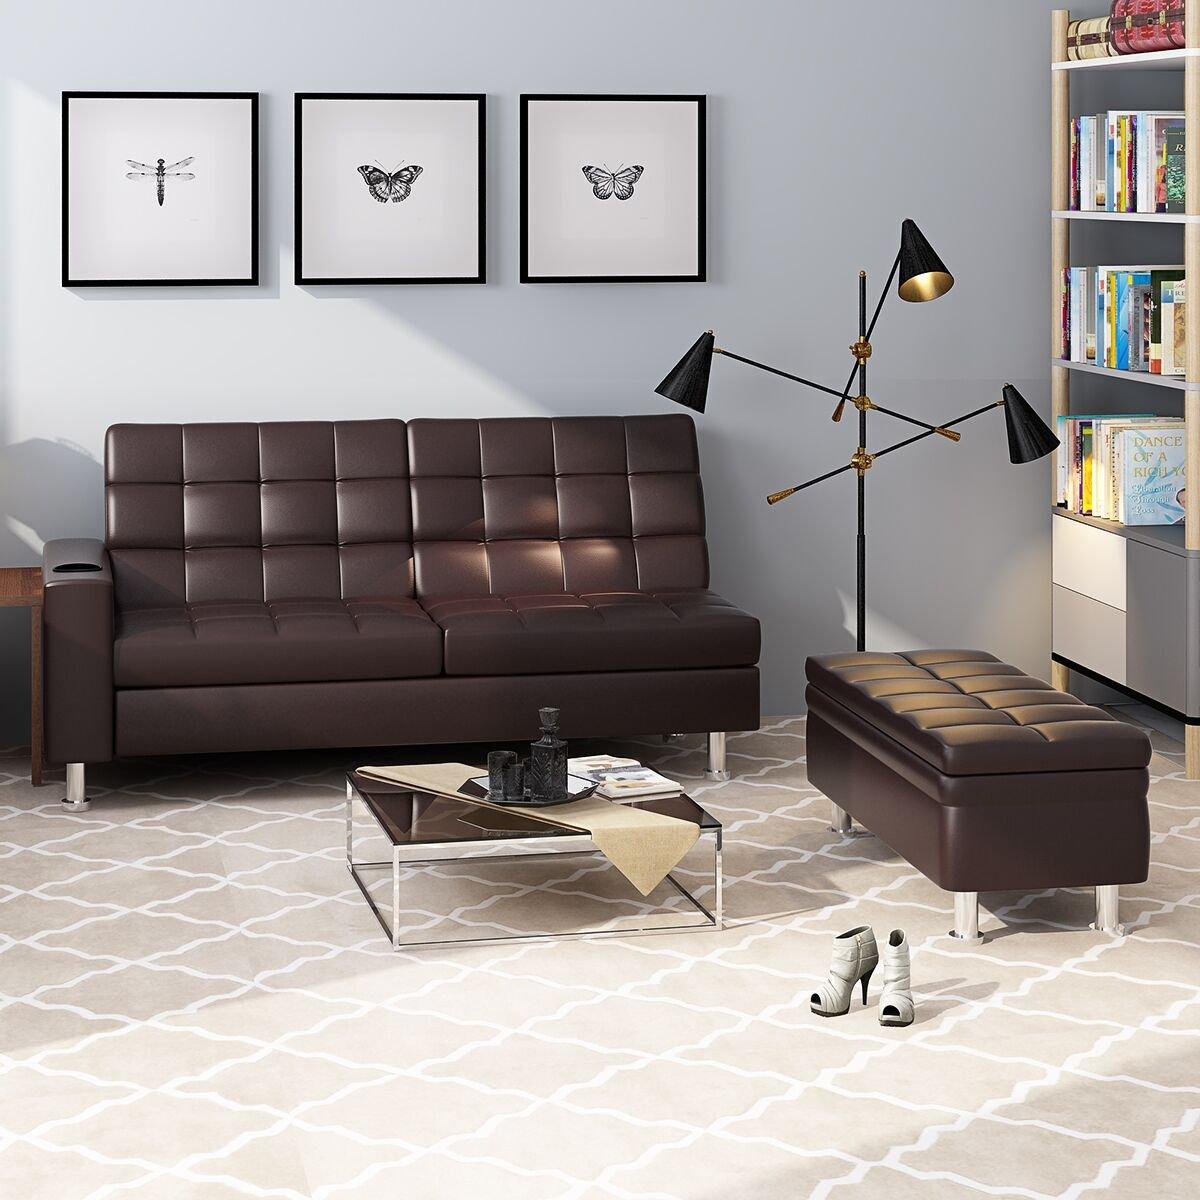 Fantastic Britoniture Multifunctional Faux Leather Folding Sofa Bed Uwap Interior Chair Design Uwaporg